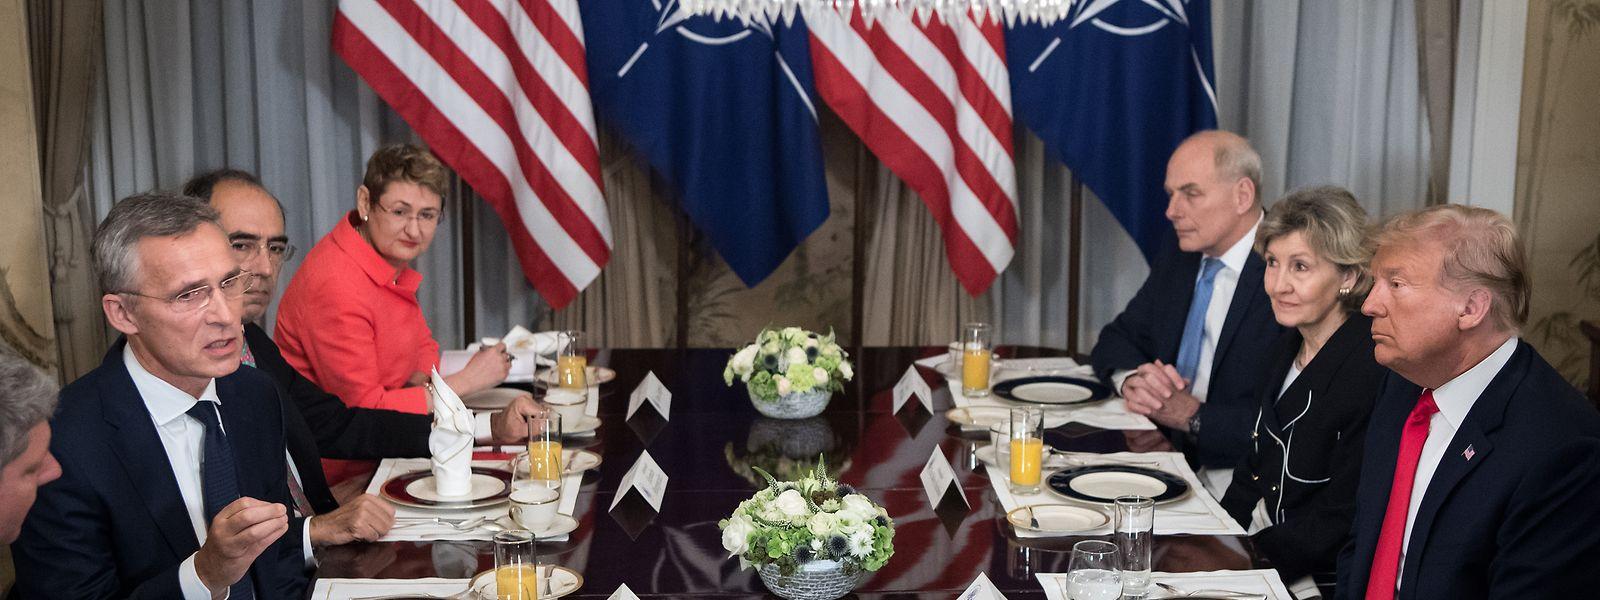 Donald Trump und Jens Stoltenberg beim Frühstück.